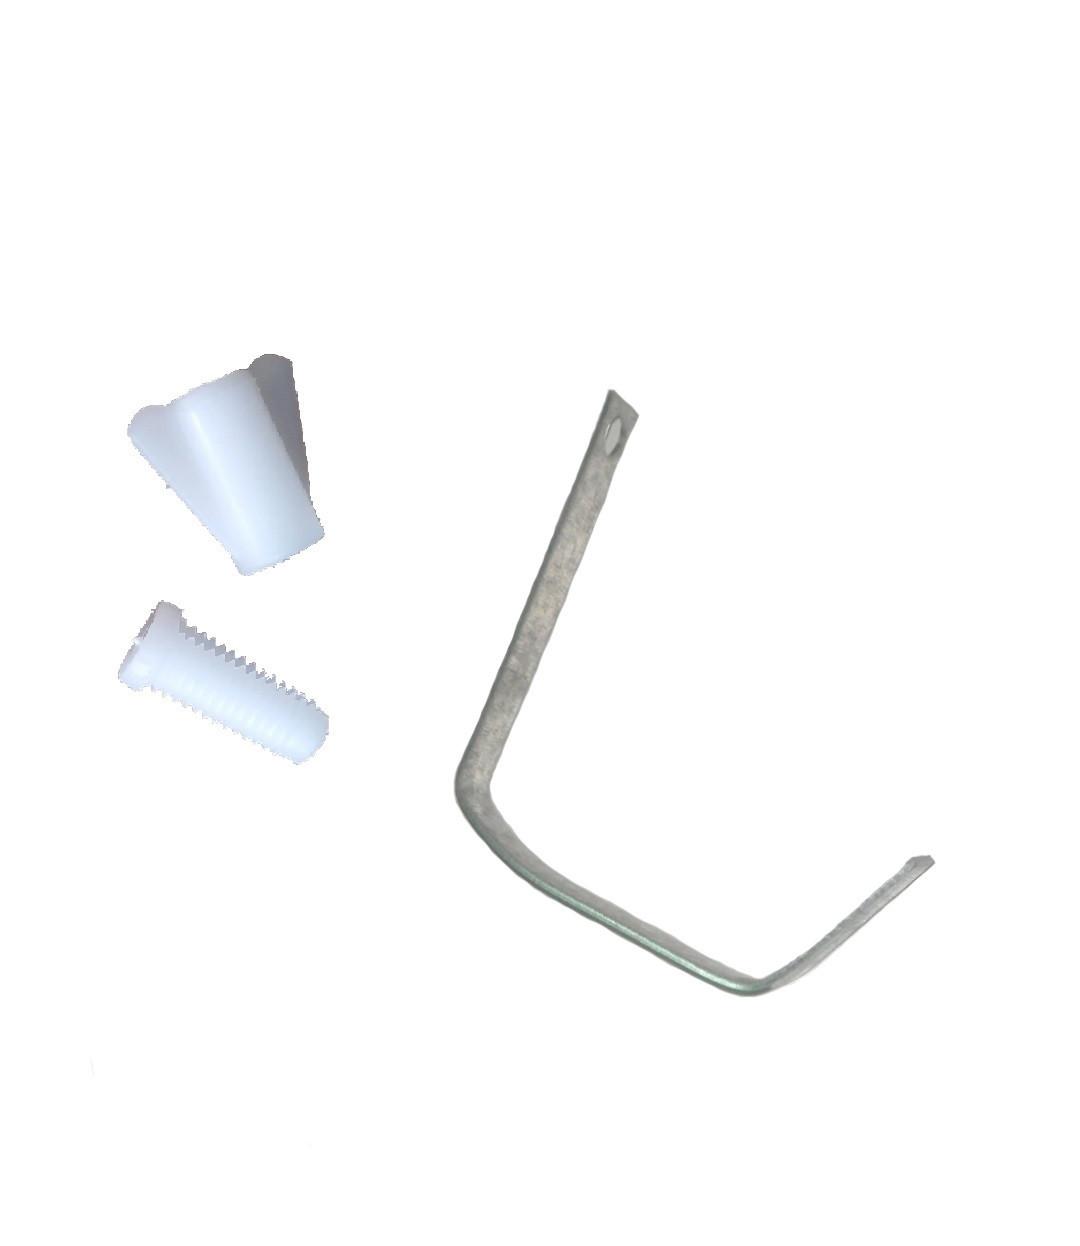 Крючок с крепежом на пластиковую кормушку.